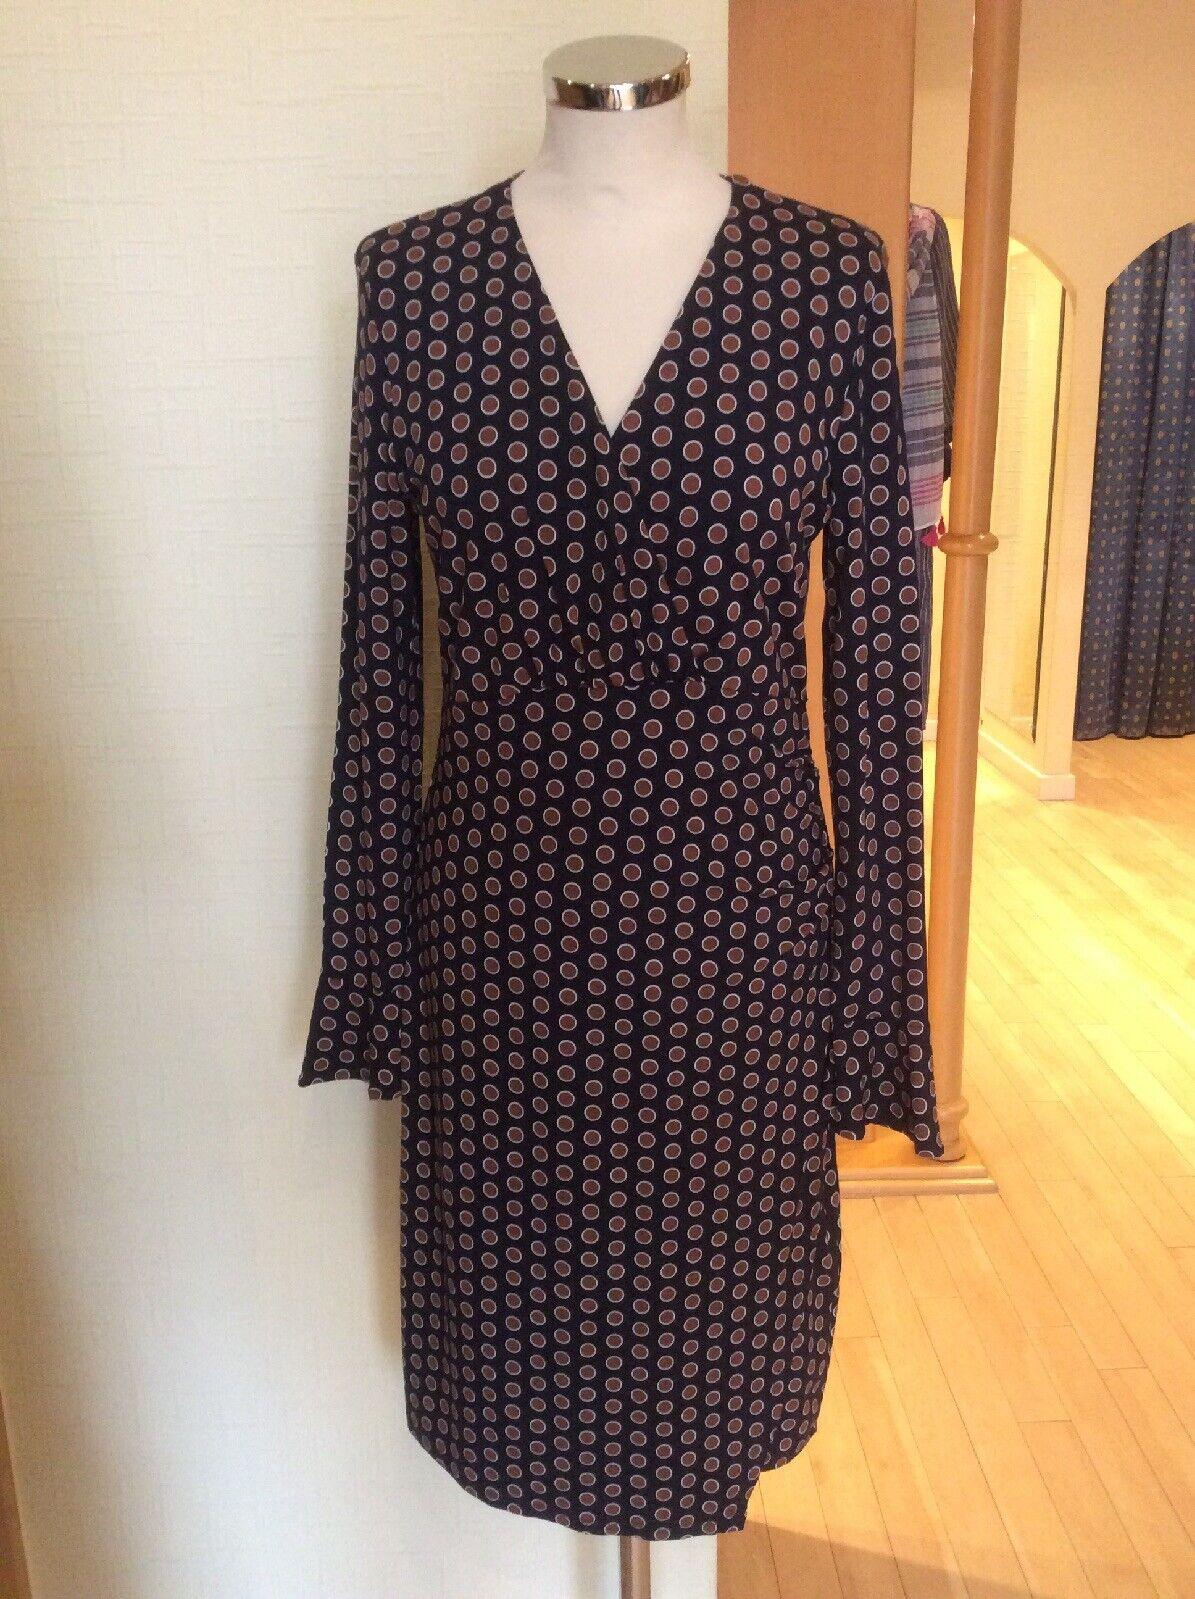 Olsen Dress Größe 18 BNWT Navy braun Spots   Now